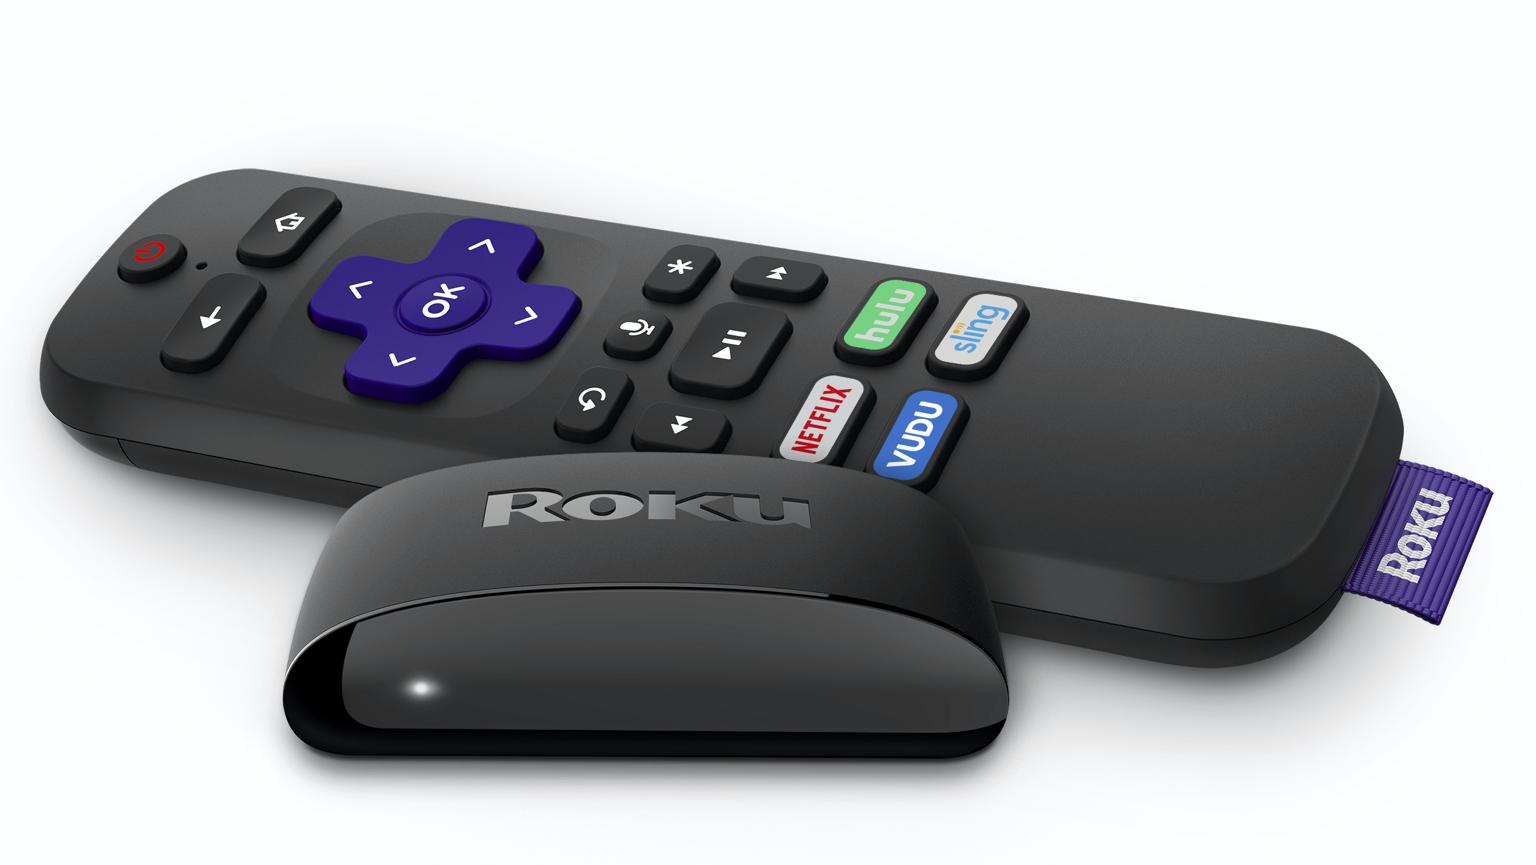 Roku Express Plus streaming player